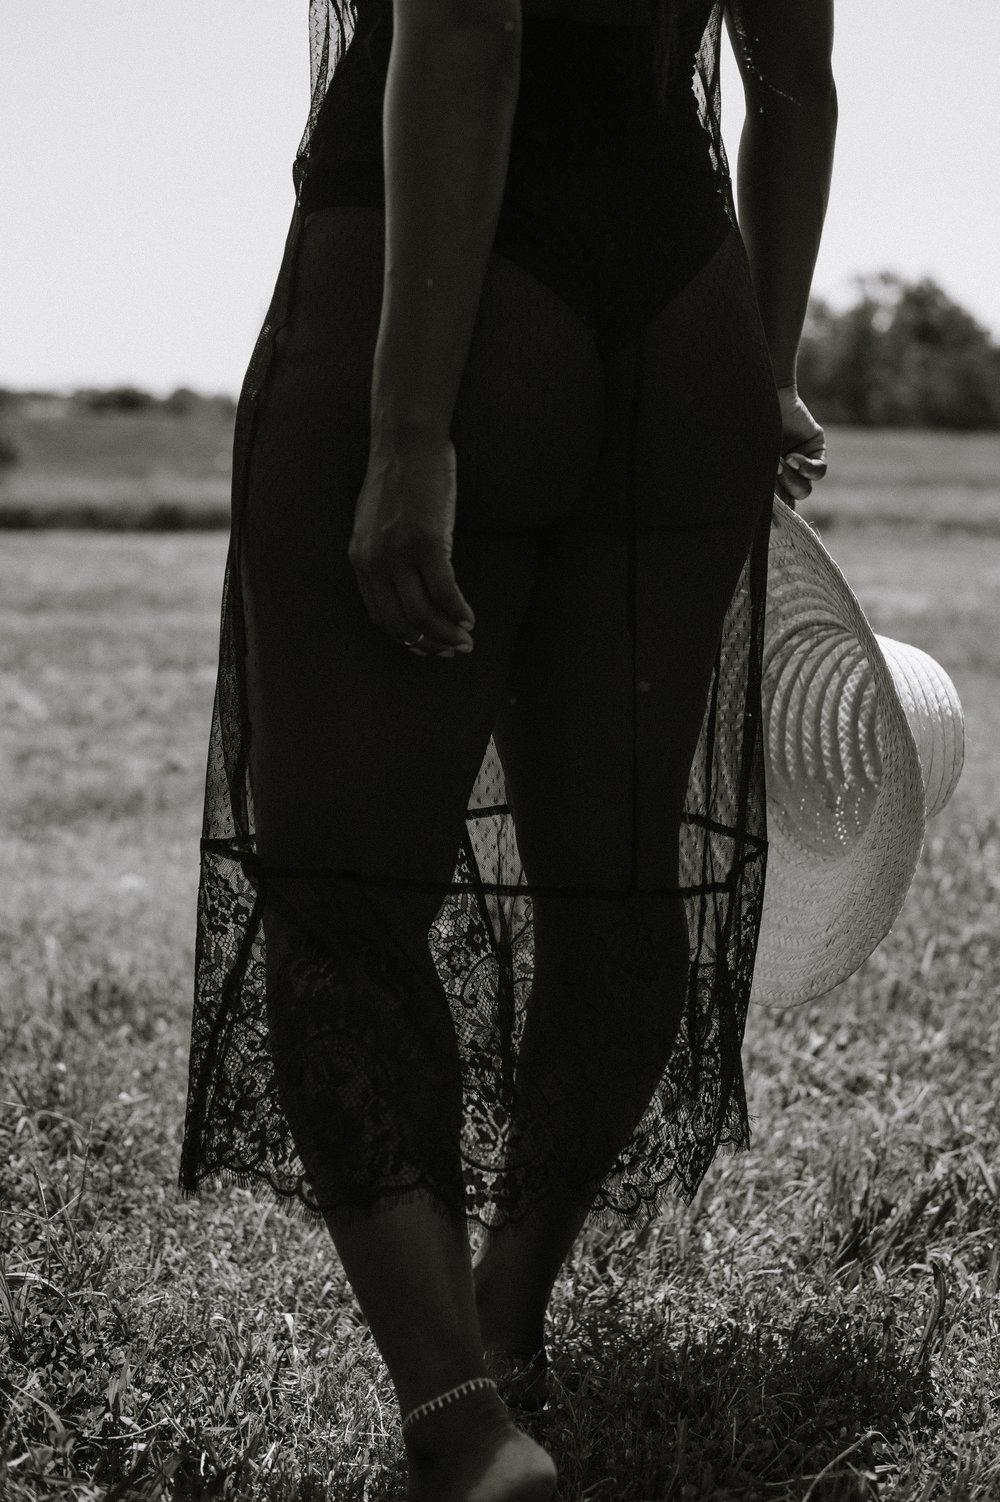 Tasha-James-The-Glossier-Blogger-Fashion-Style-HM-Lace-Dress-Black-44.jpg